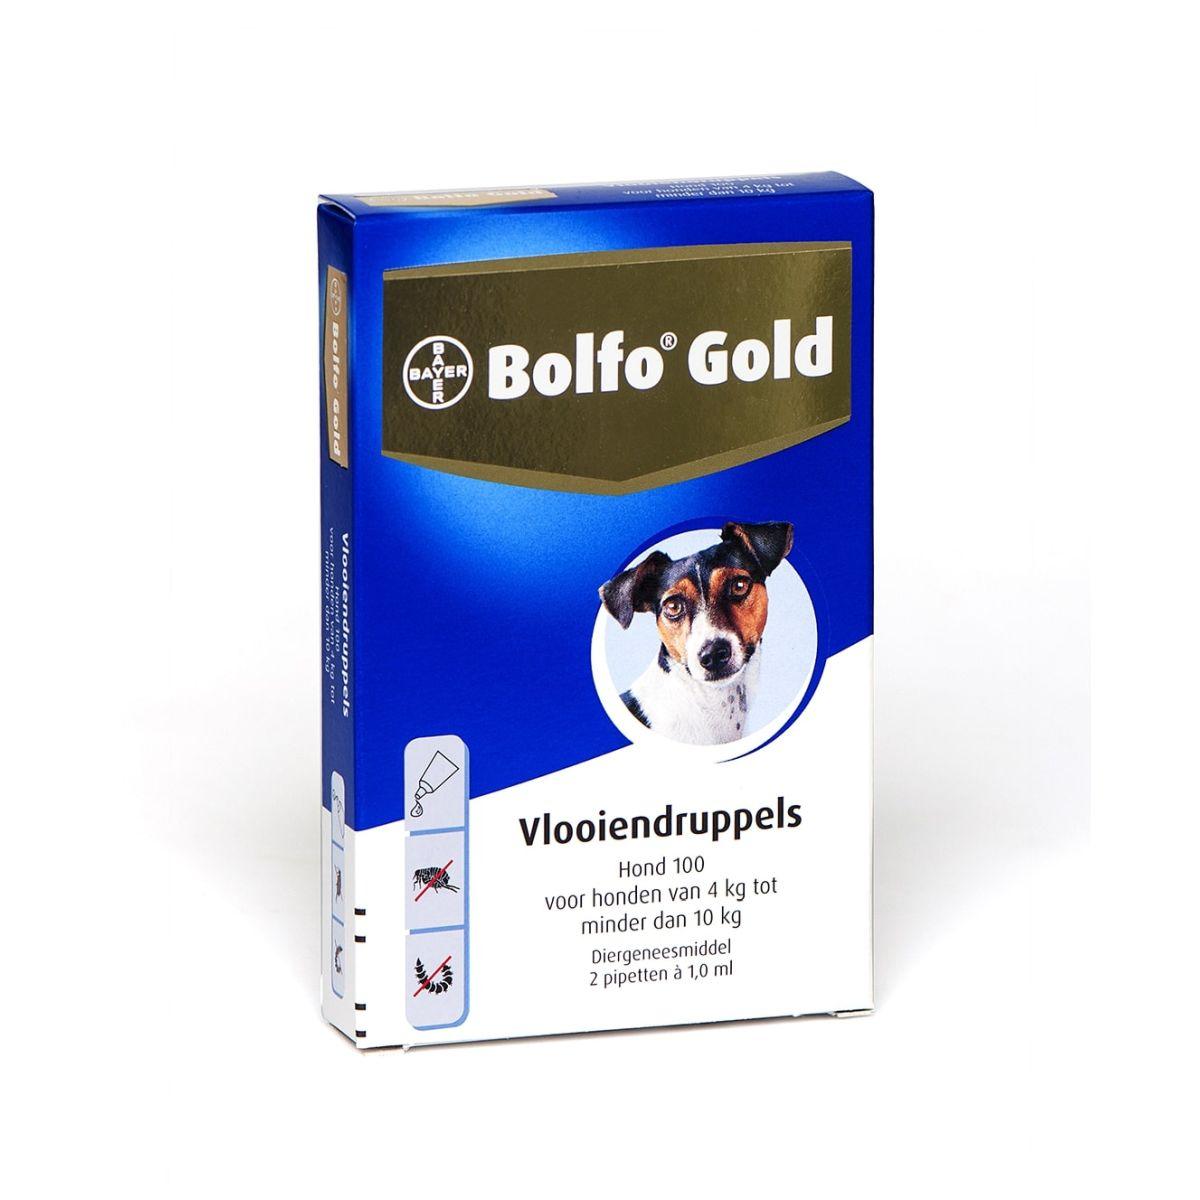 BA BOLFO GOLD HOND 100 2PIP 00001